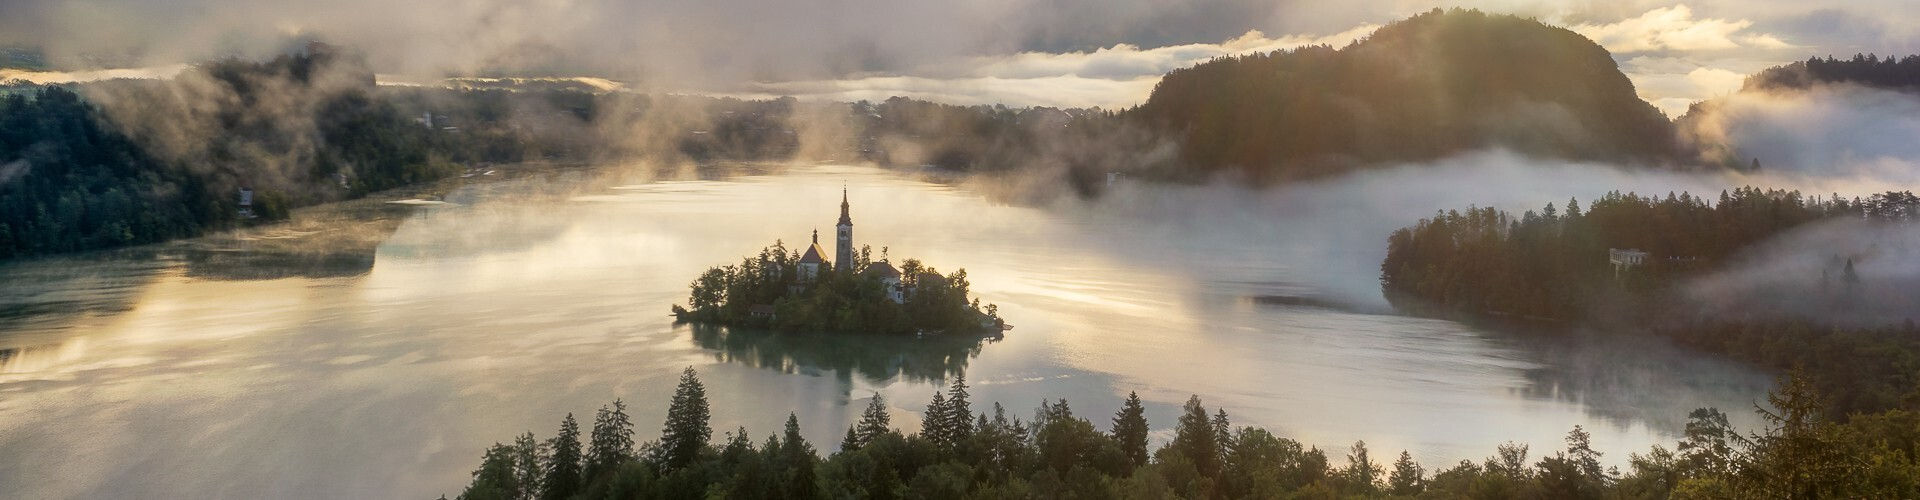 voyage photo slovenie aliaume chapelle header